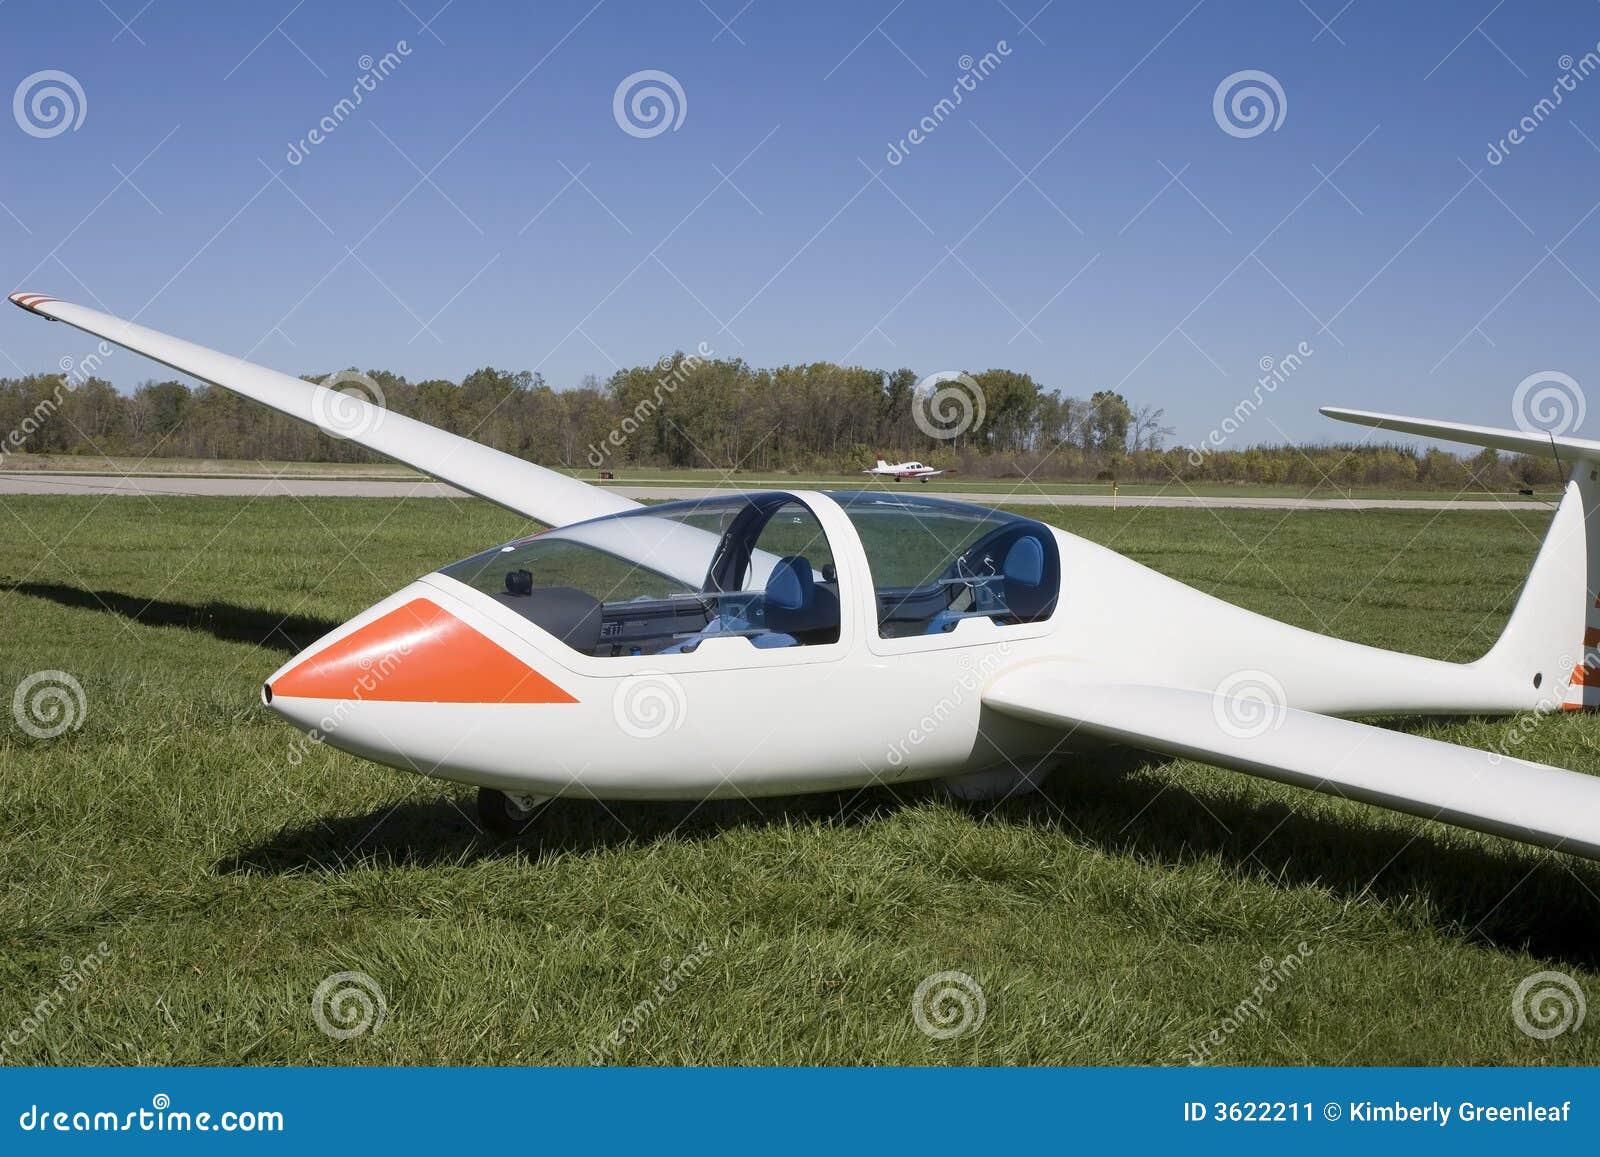 glider sailplane stock image image of outside flying 3622211